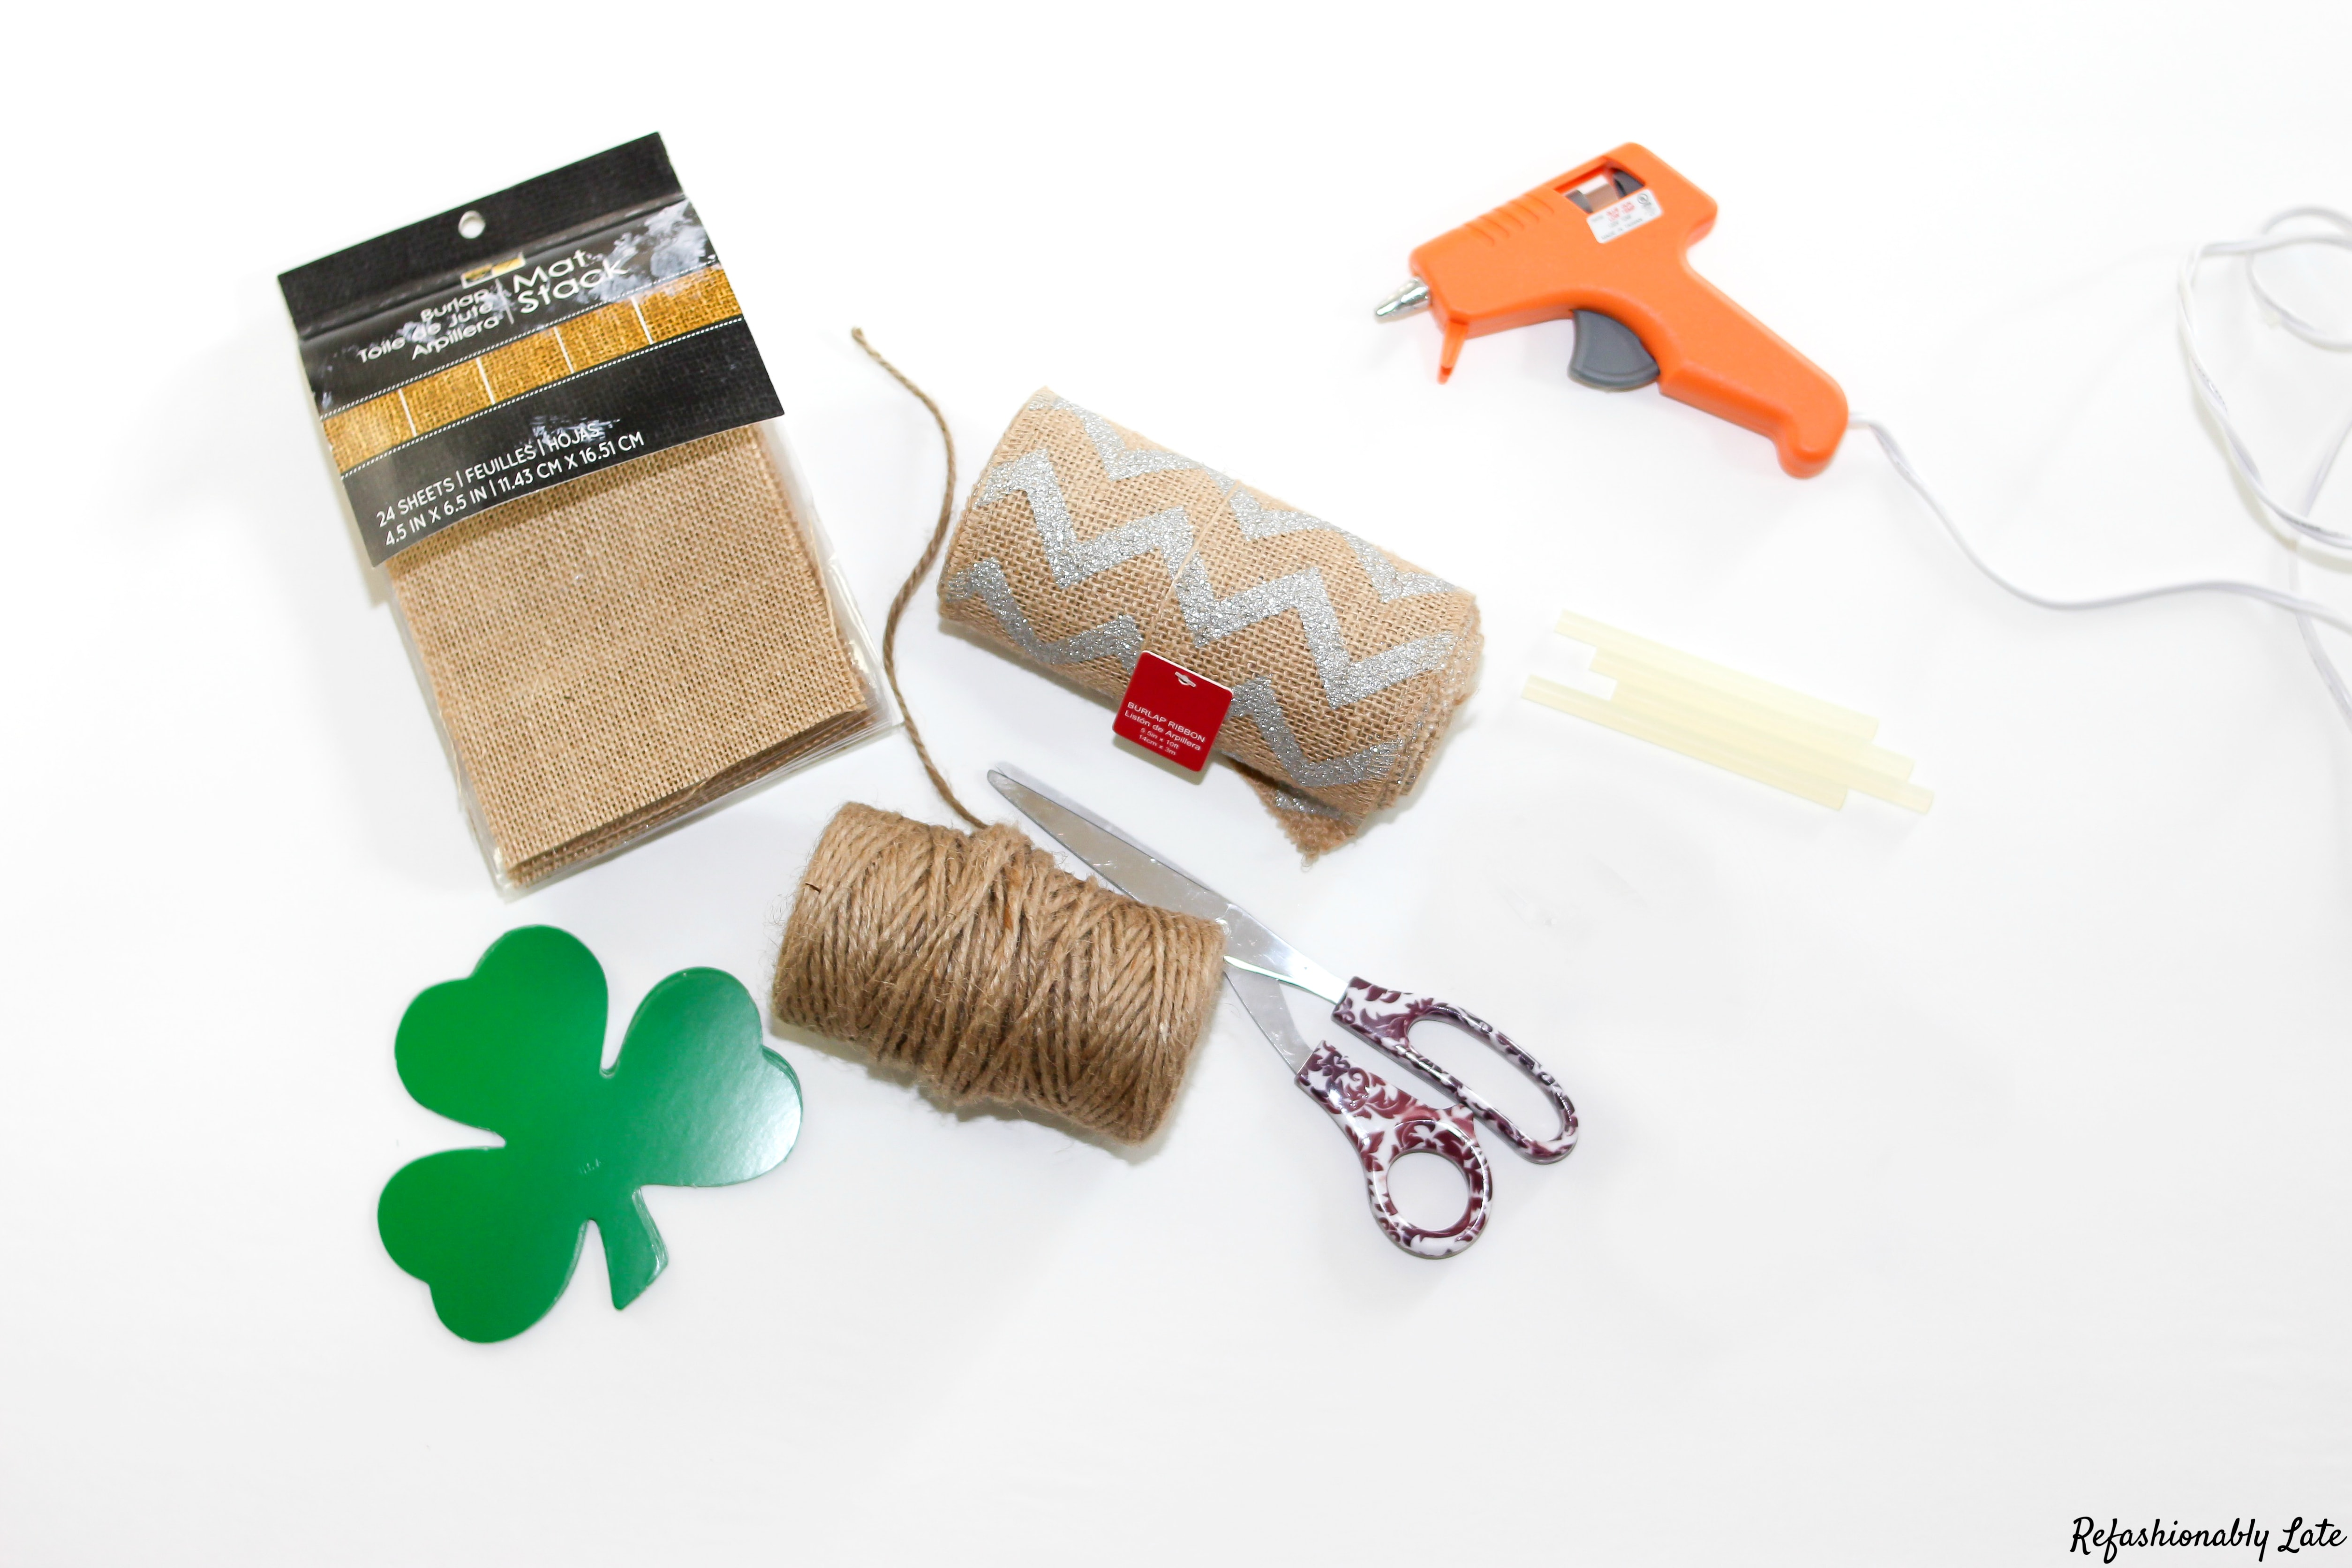 St. Patrick's Day Quick DIY Banner - www.refashionablylate.com